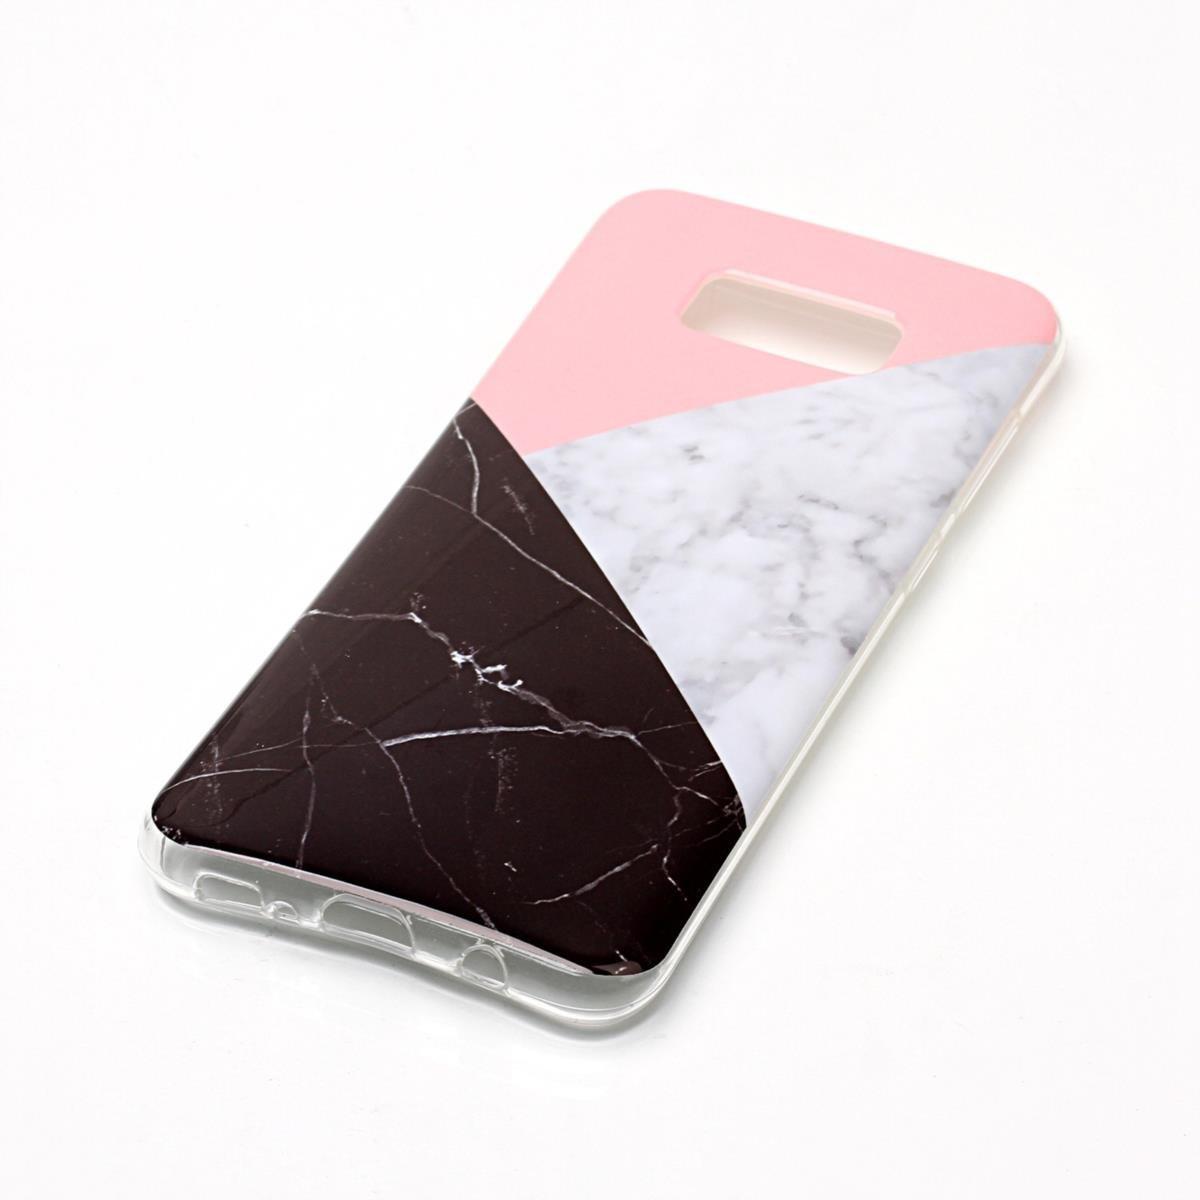 M/ármol Dise/ño Funda de Silicona Suave Case Cover Protecci/ón c/áscara Soft Gel TPU Carcasa Funda para SAMS Meeter Funda para Samsung S8 Plus Samsung Galaxy S8 Plus Funda Silicona M/ármol